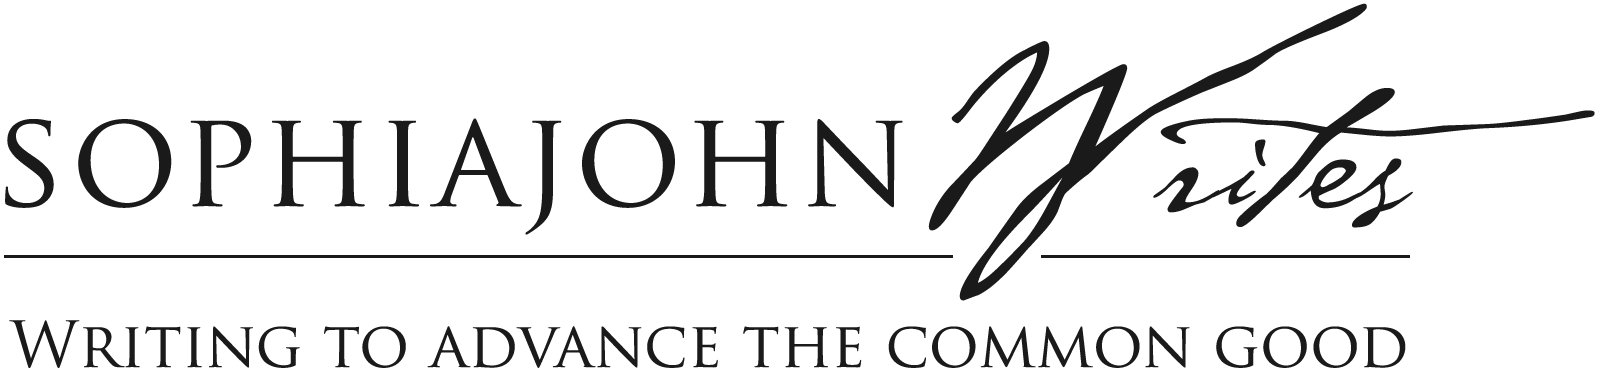 Sophiajohn Writes